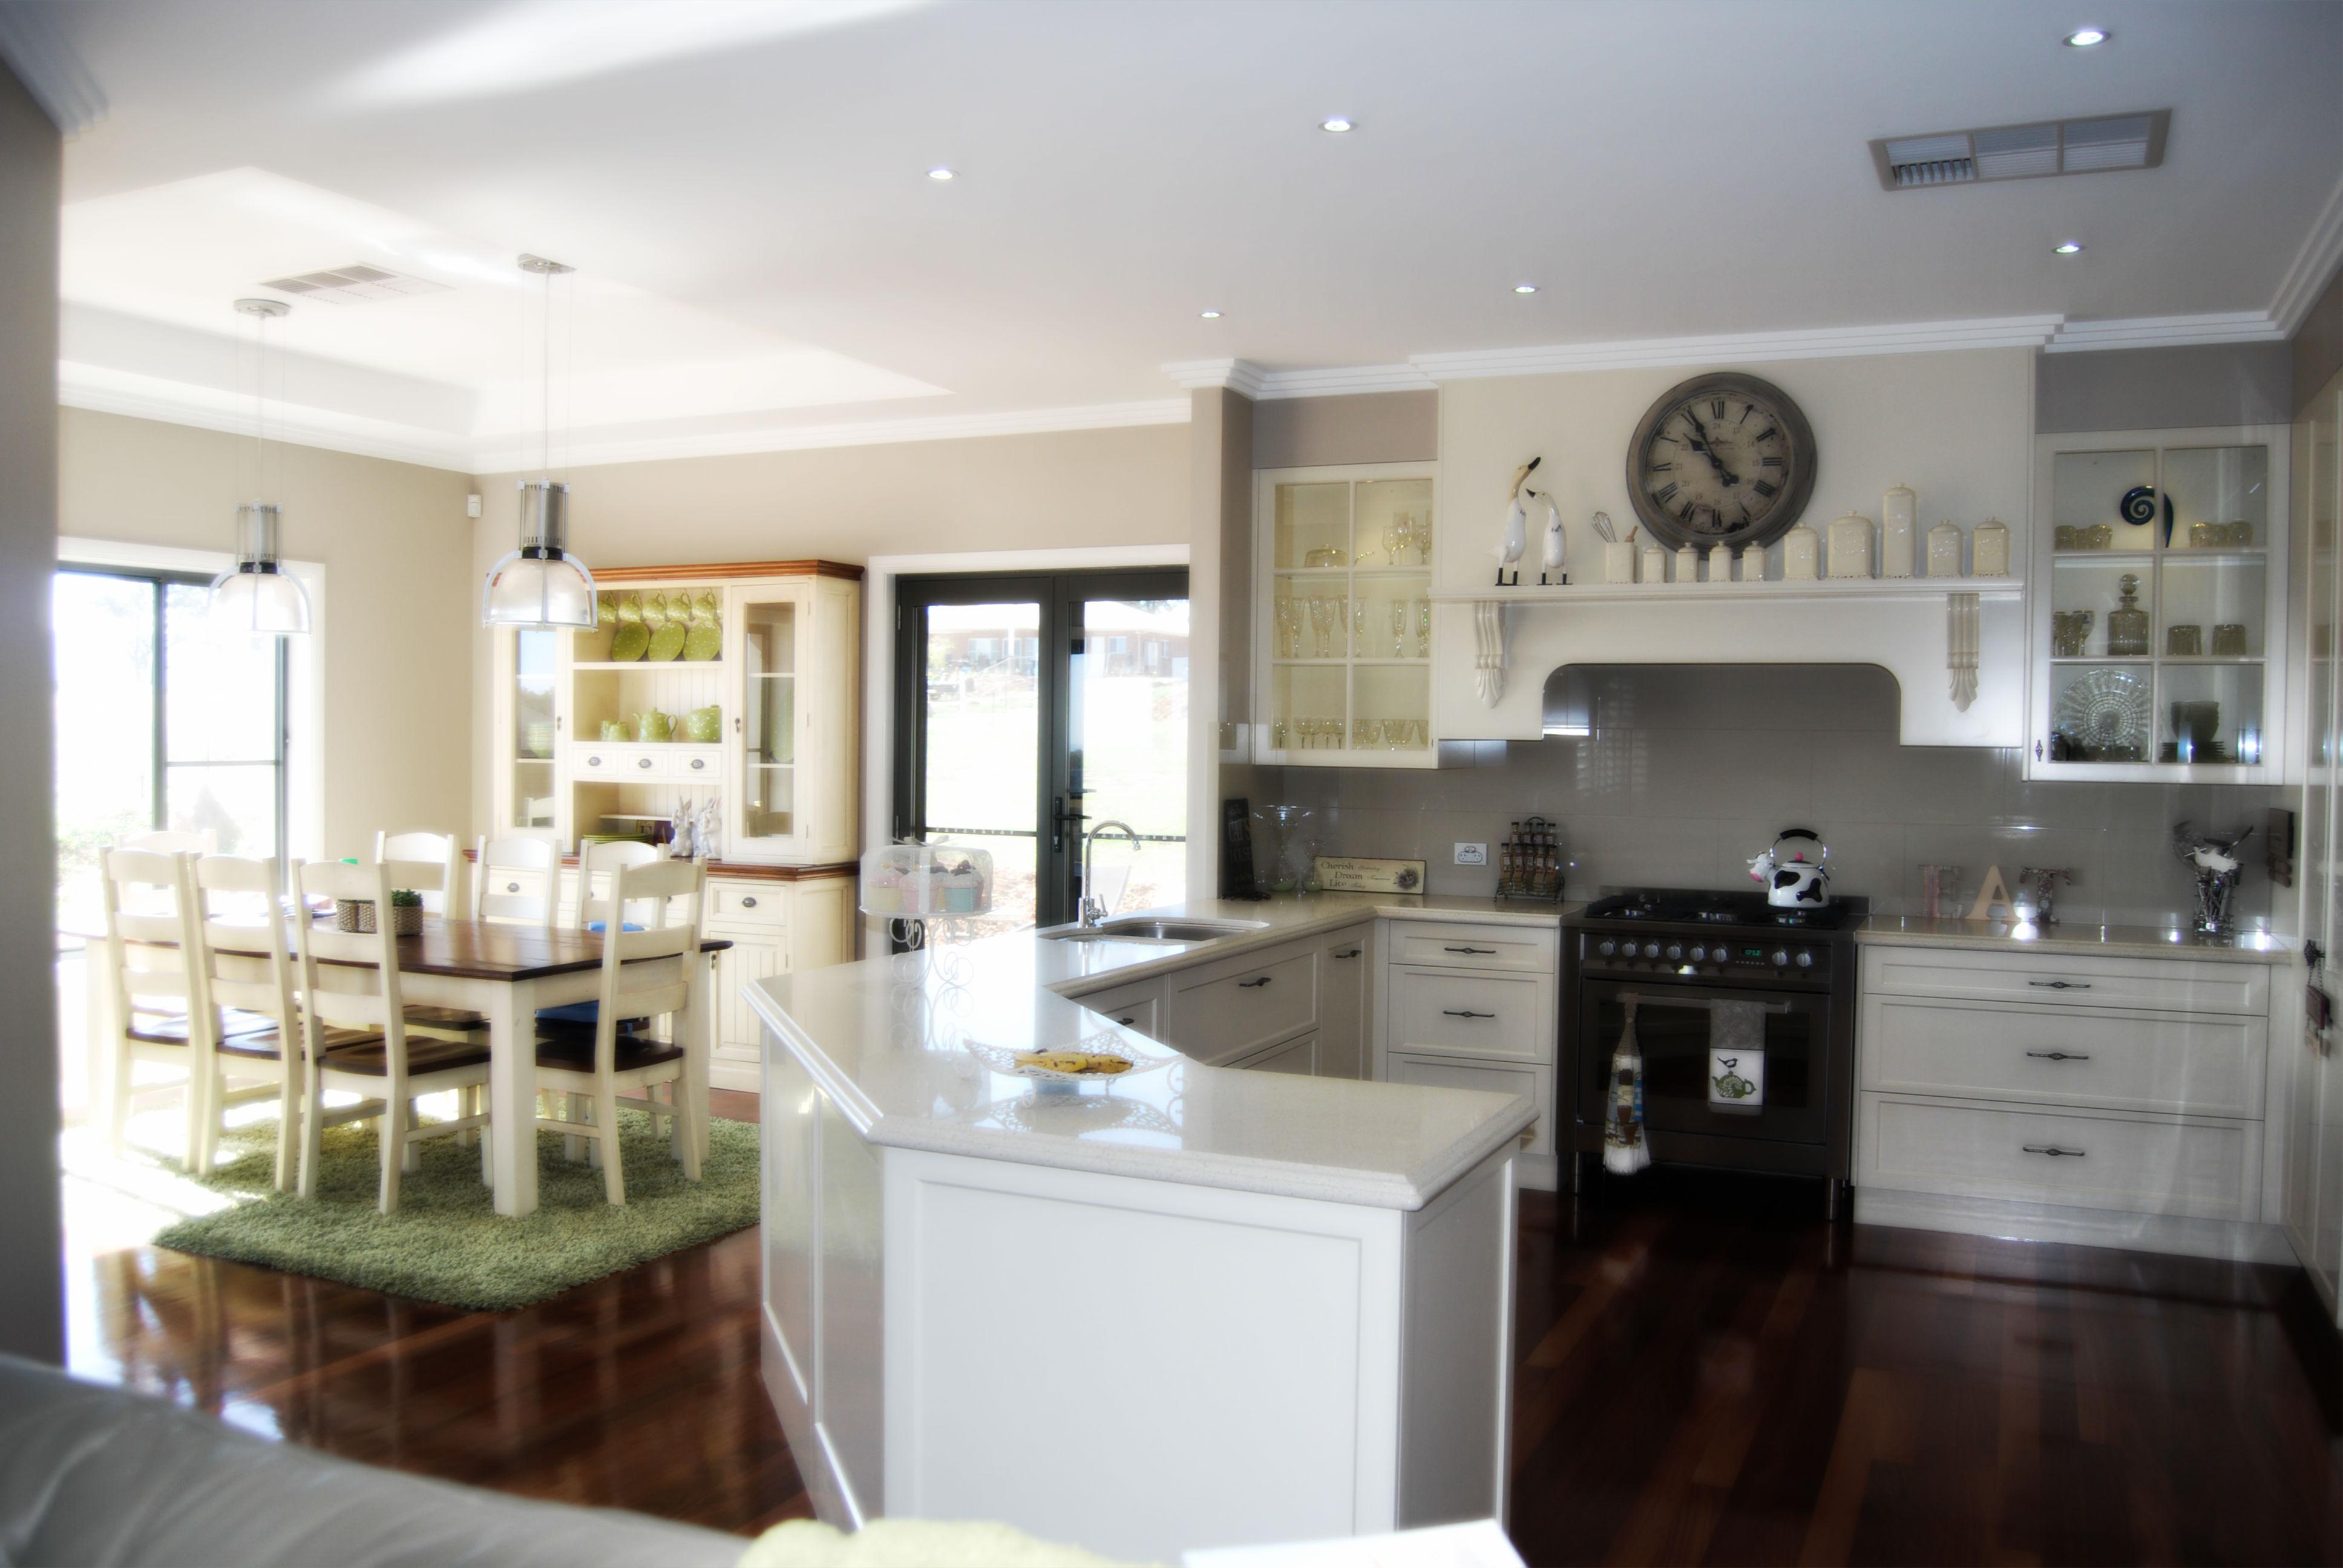 Urquhart Kitchen by SMW